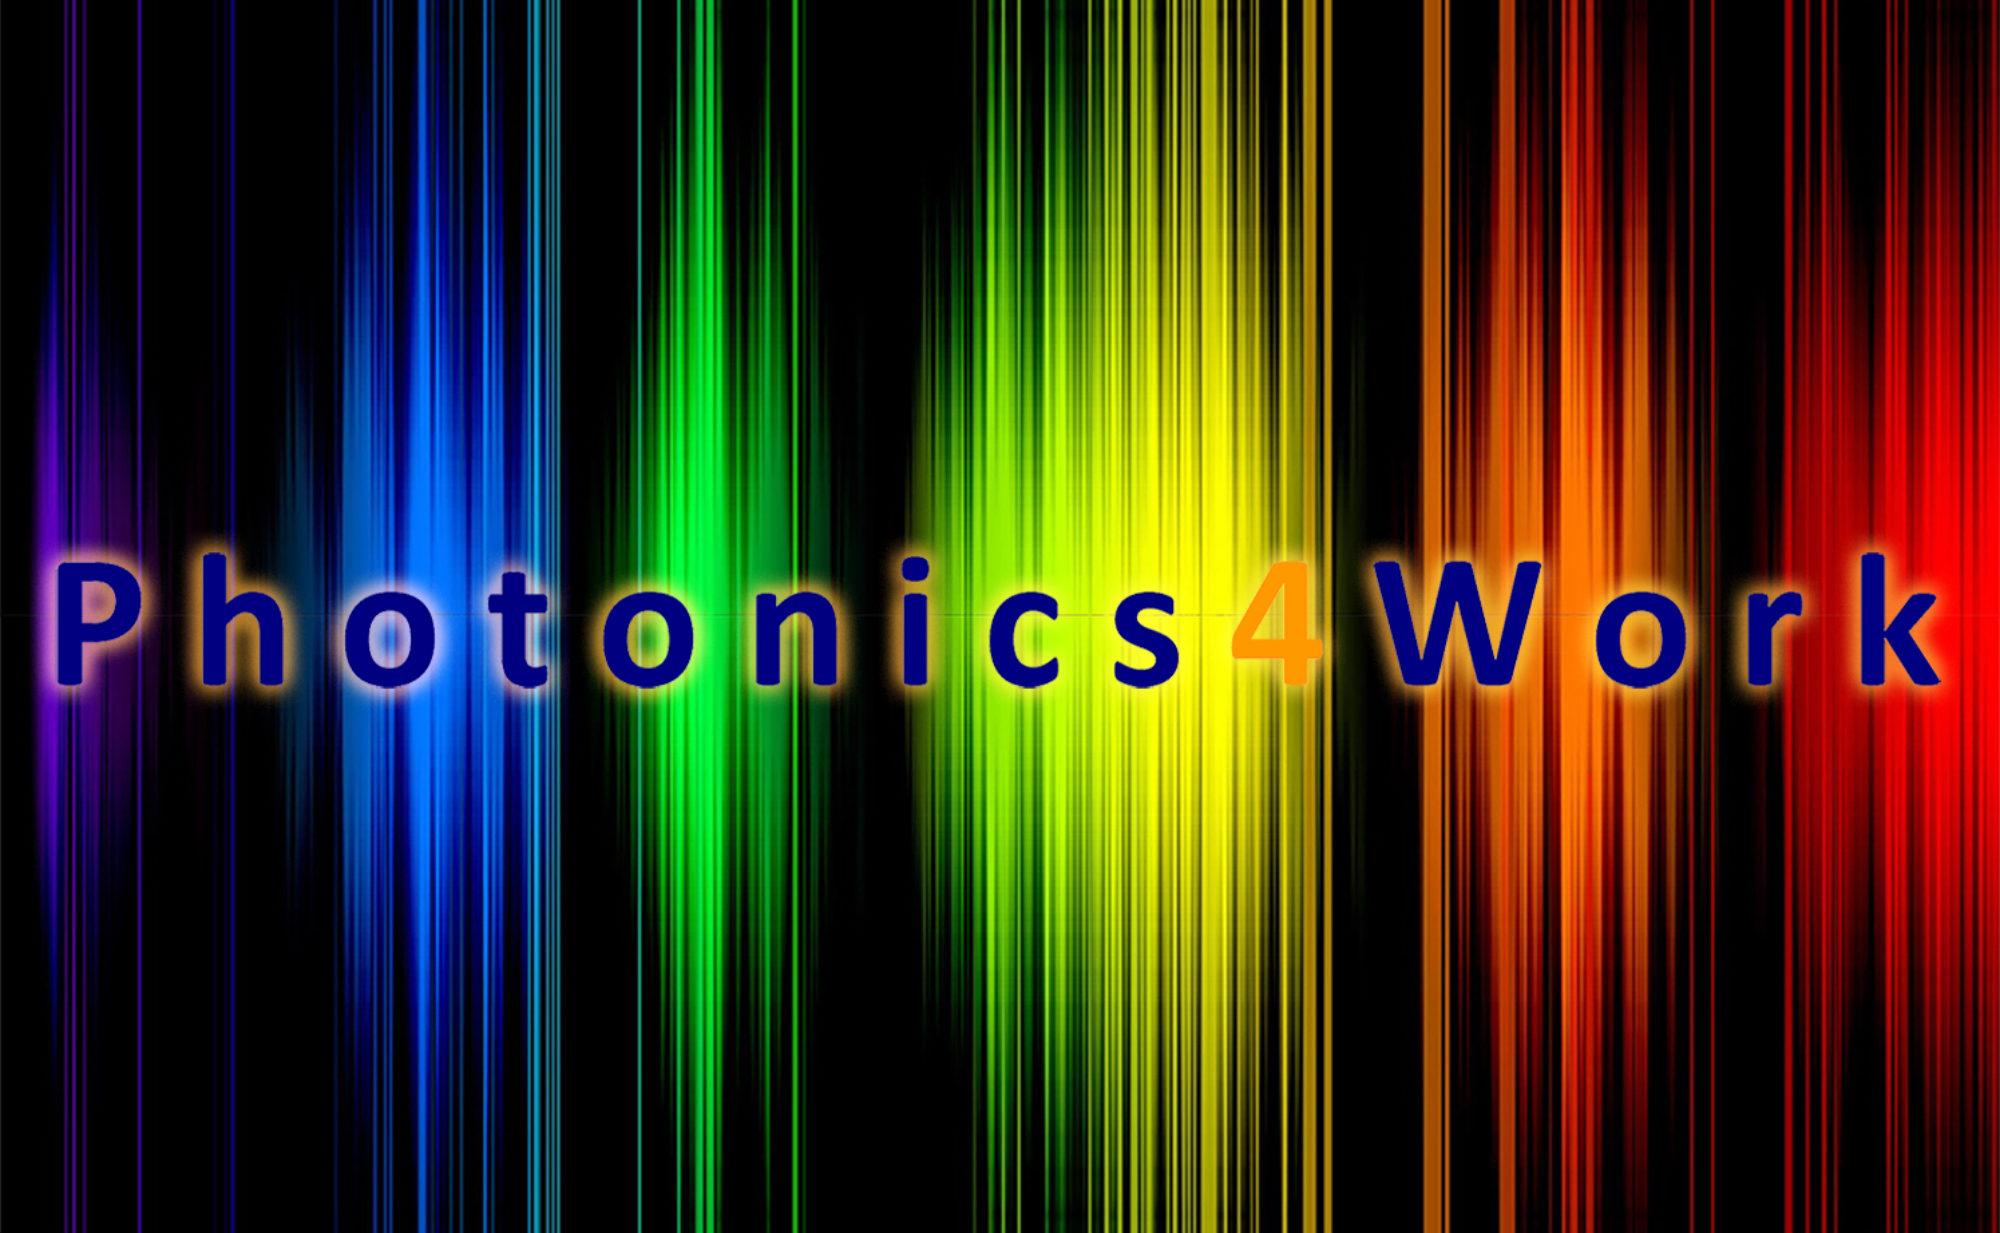 Photonics4Work